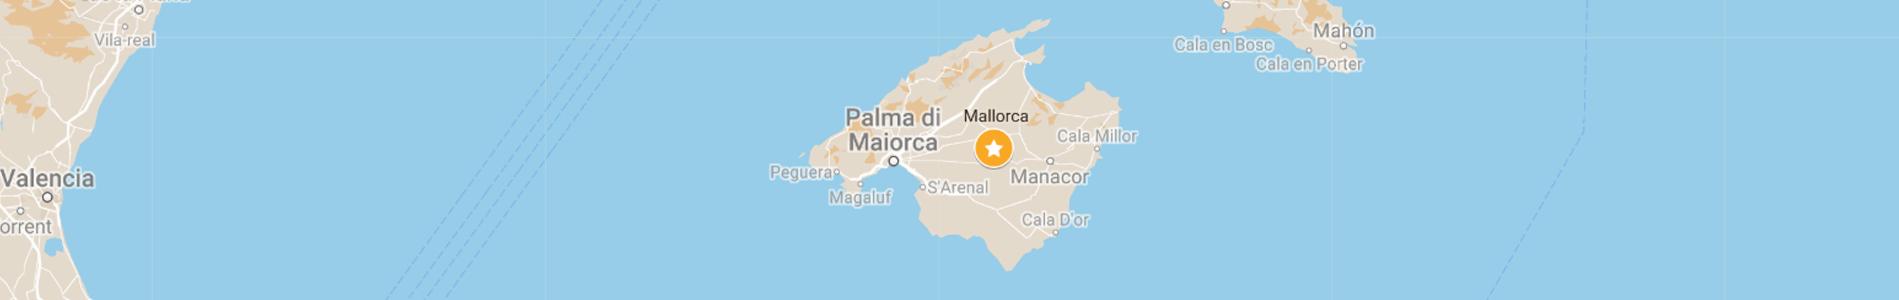 Itinerario vacanza in barca a vela alle Baleari - Minorca